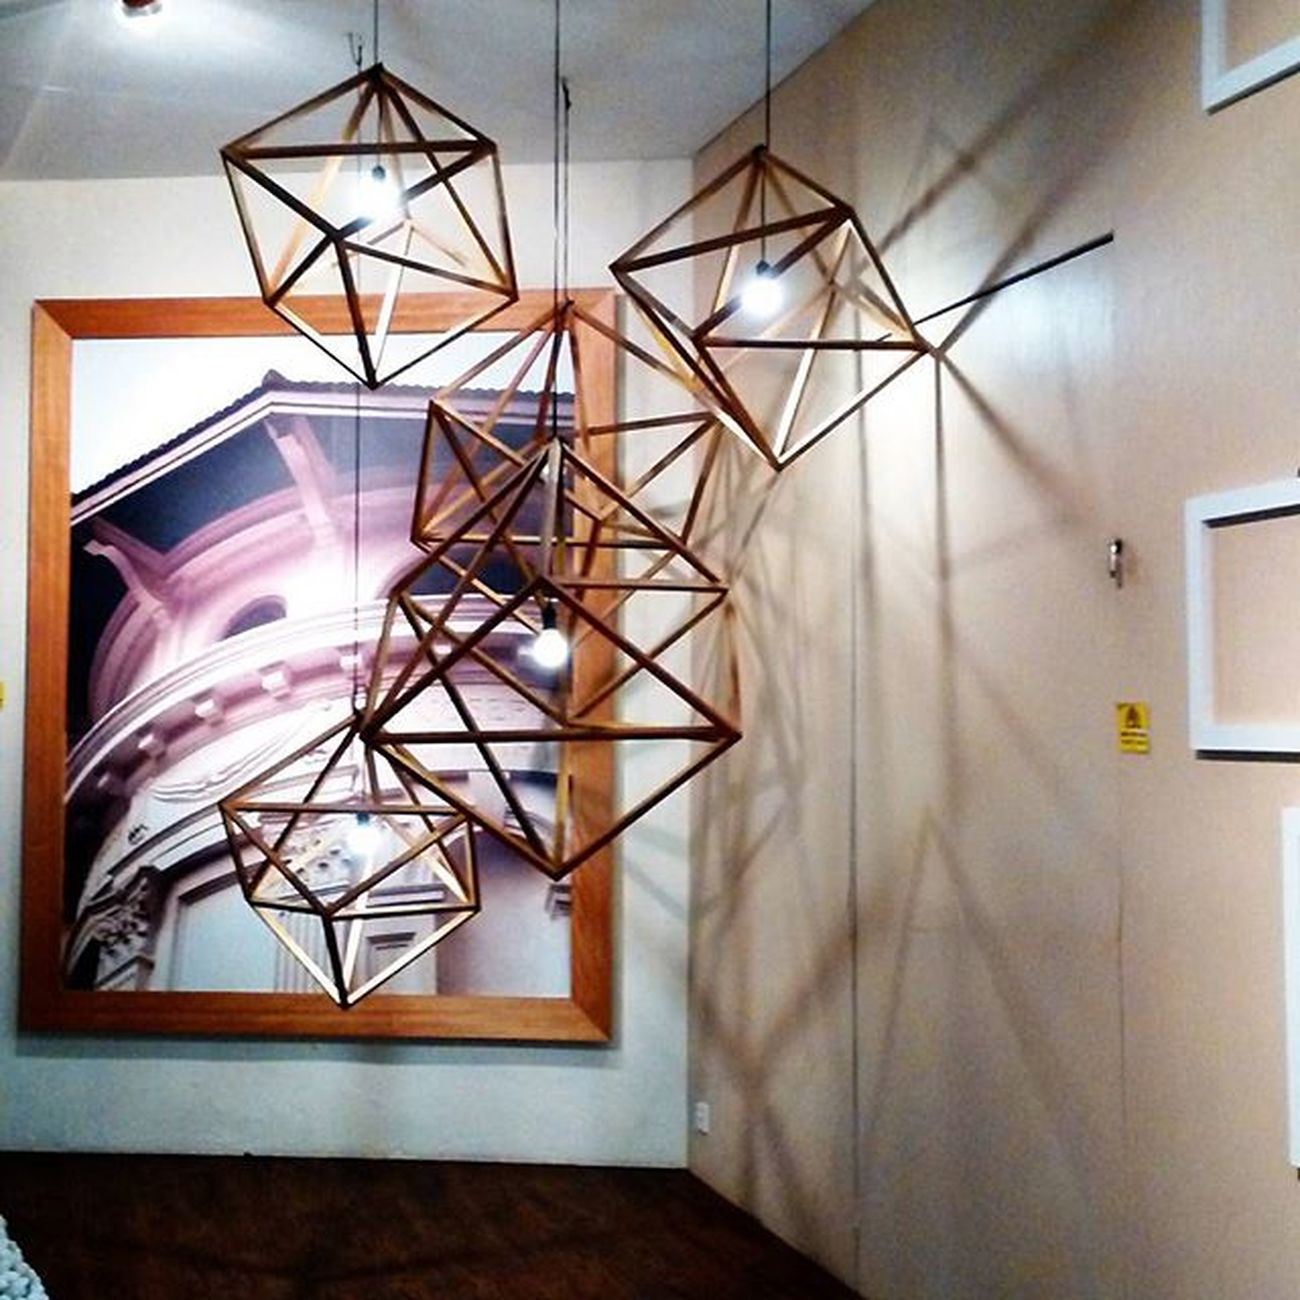 Beautiful interior design @GurneyParagon Just a simple snap shot while passing time. Gurneyparagonmall Interiordesign WoodArt